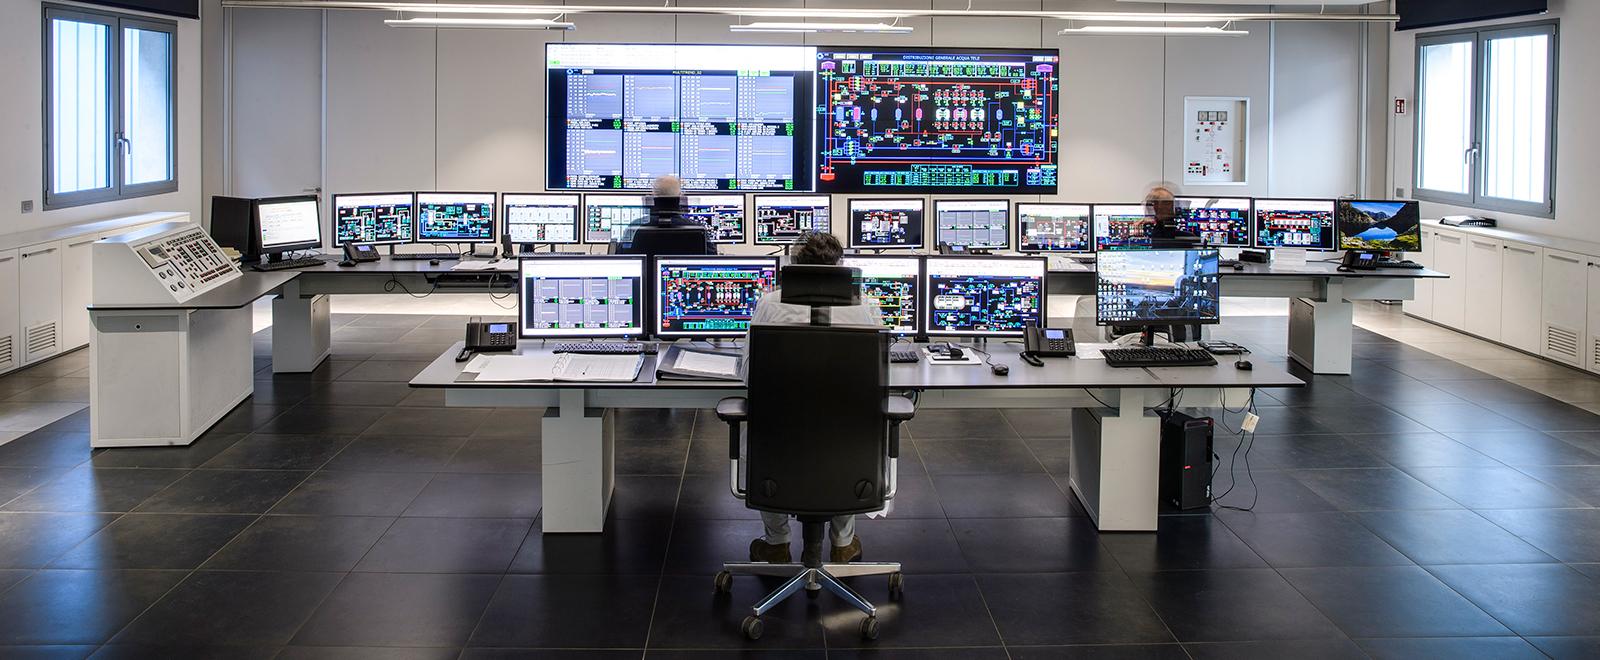 Sala controllo